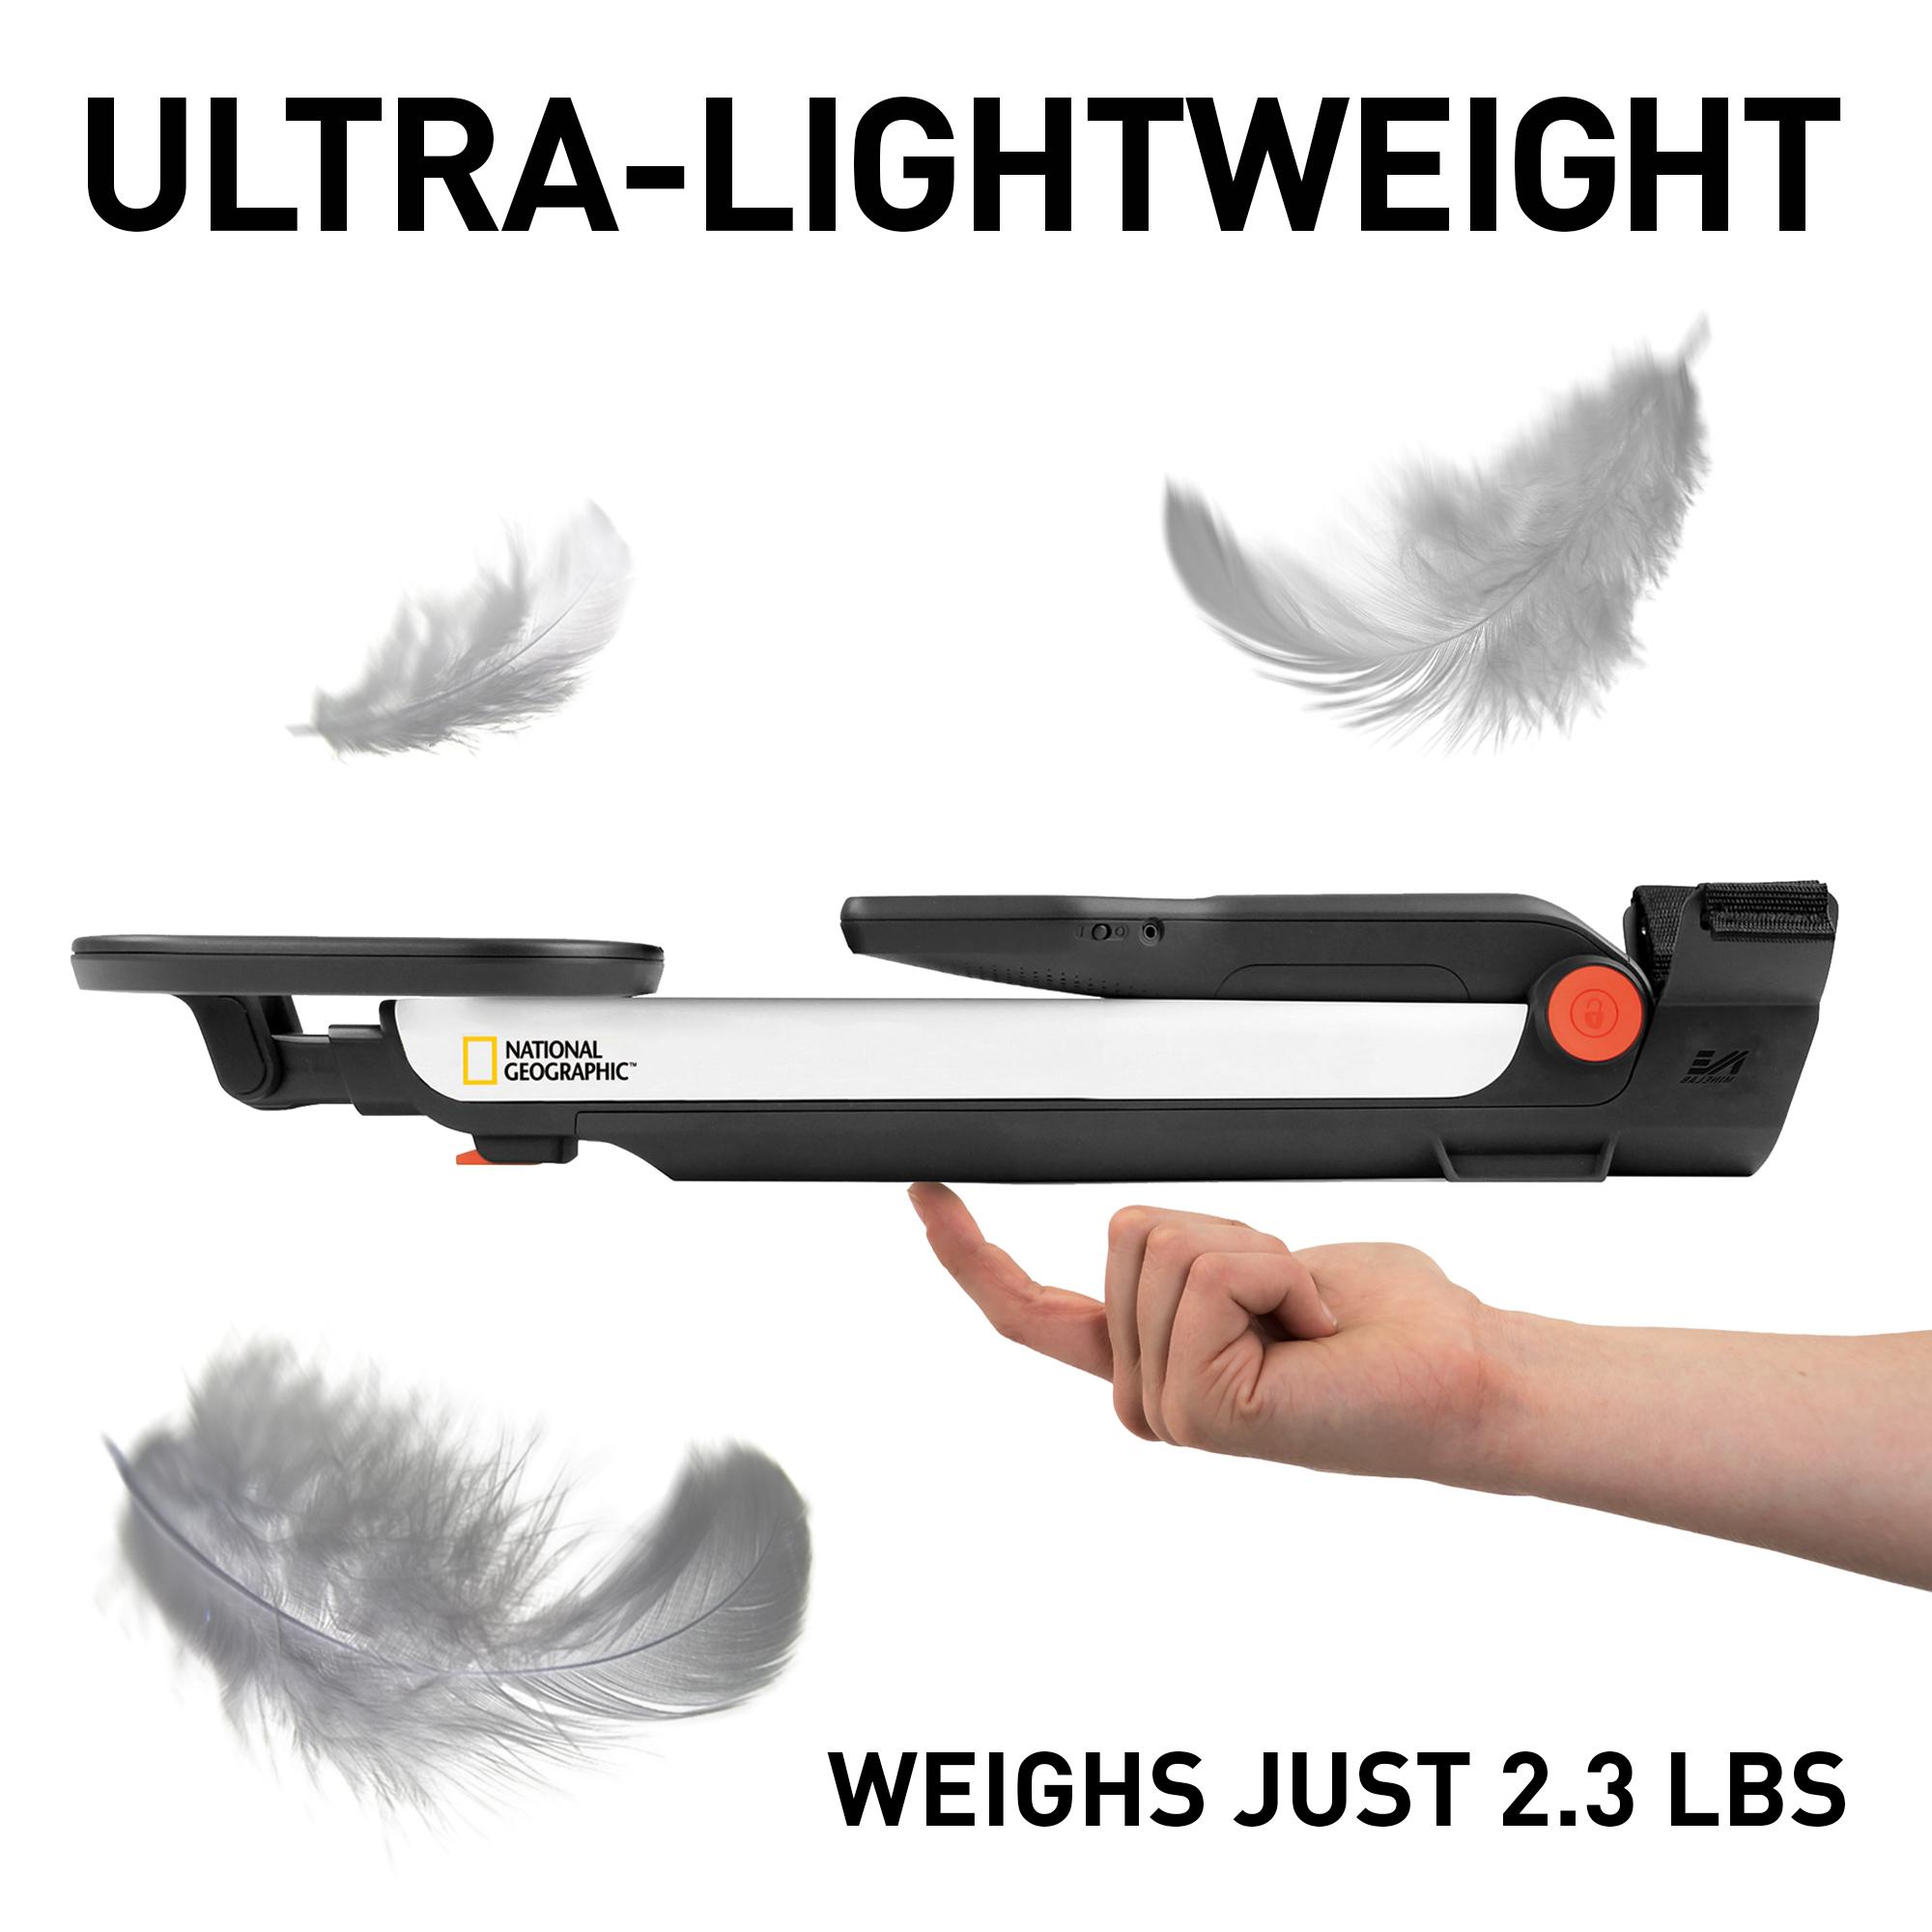 NGProdetector_02_UltraLight.jpg